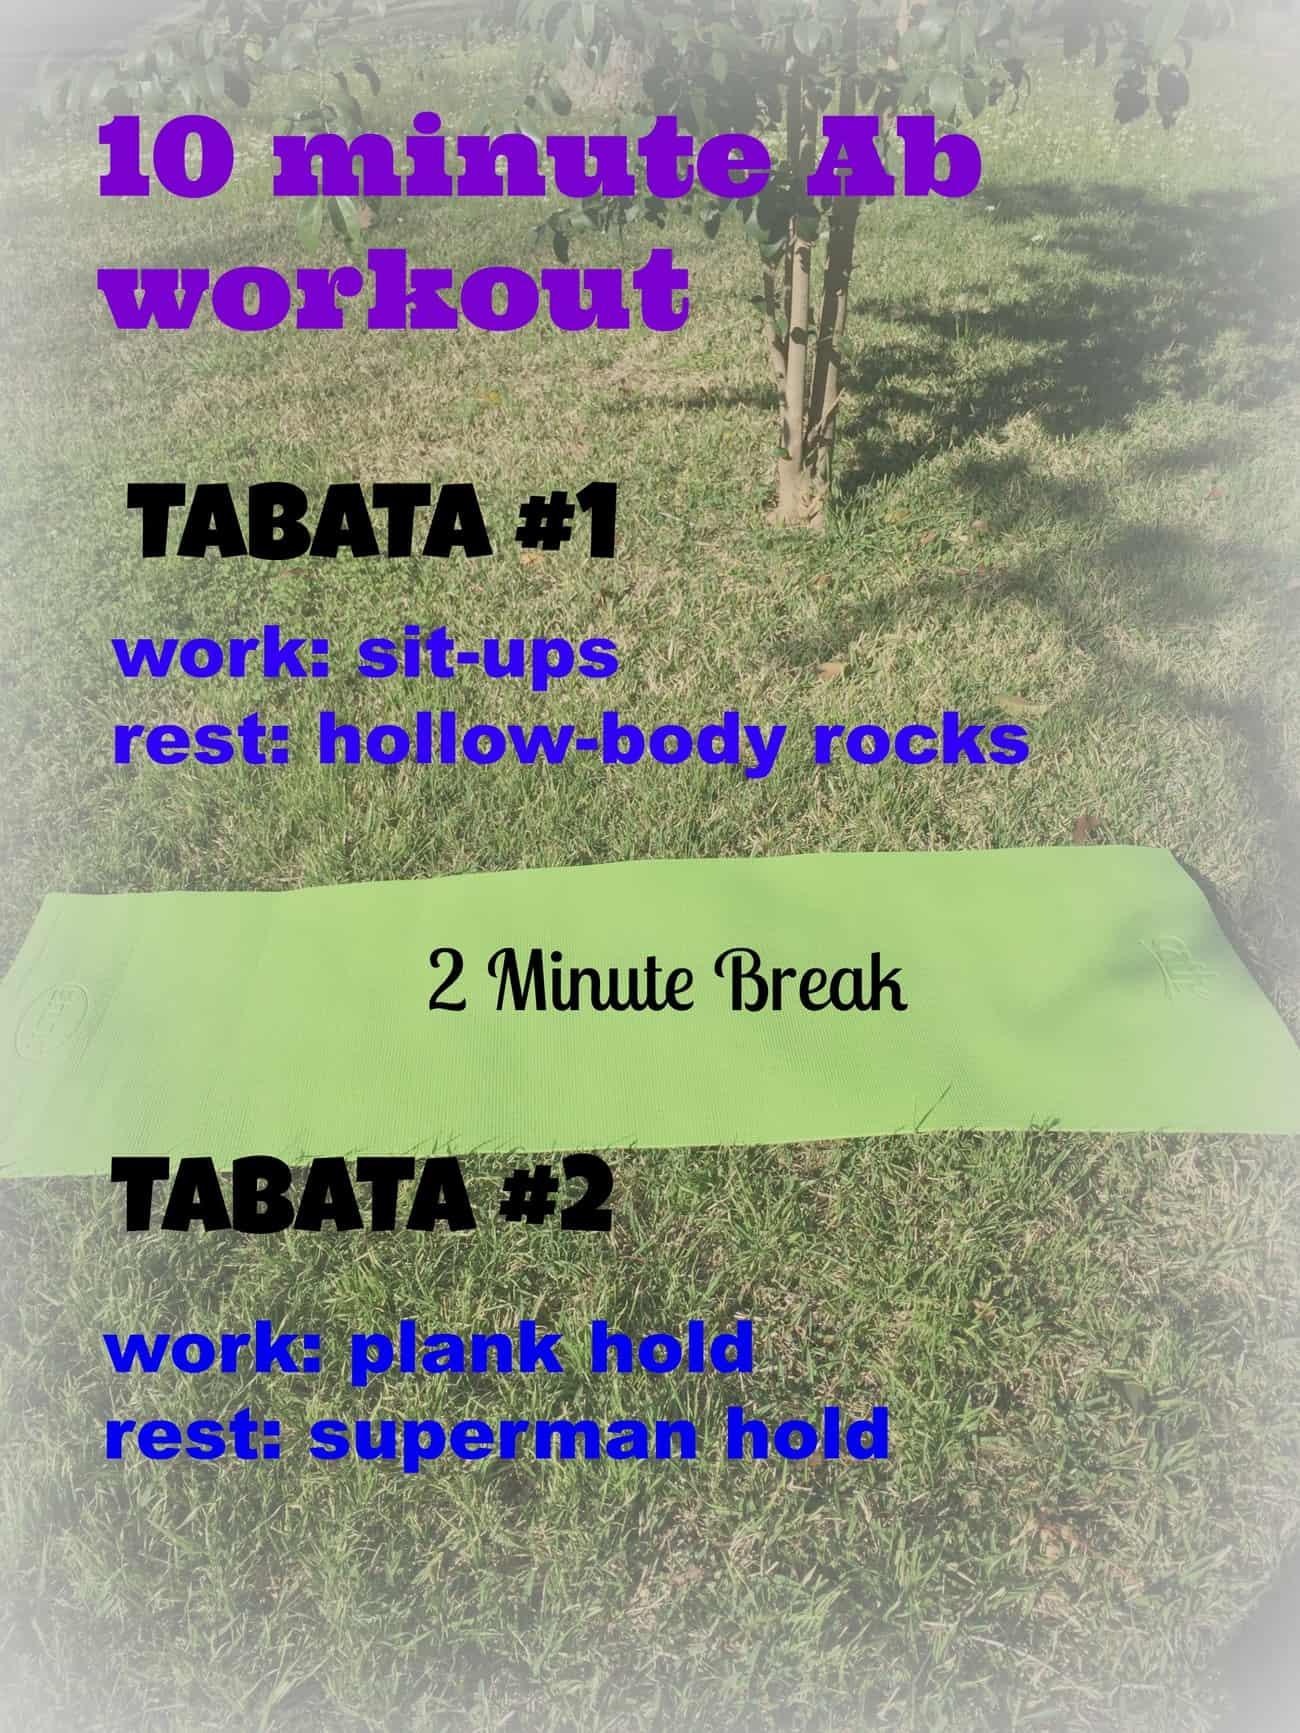 10 min ab workout text